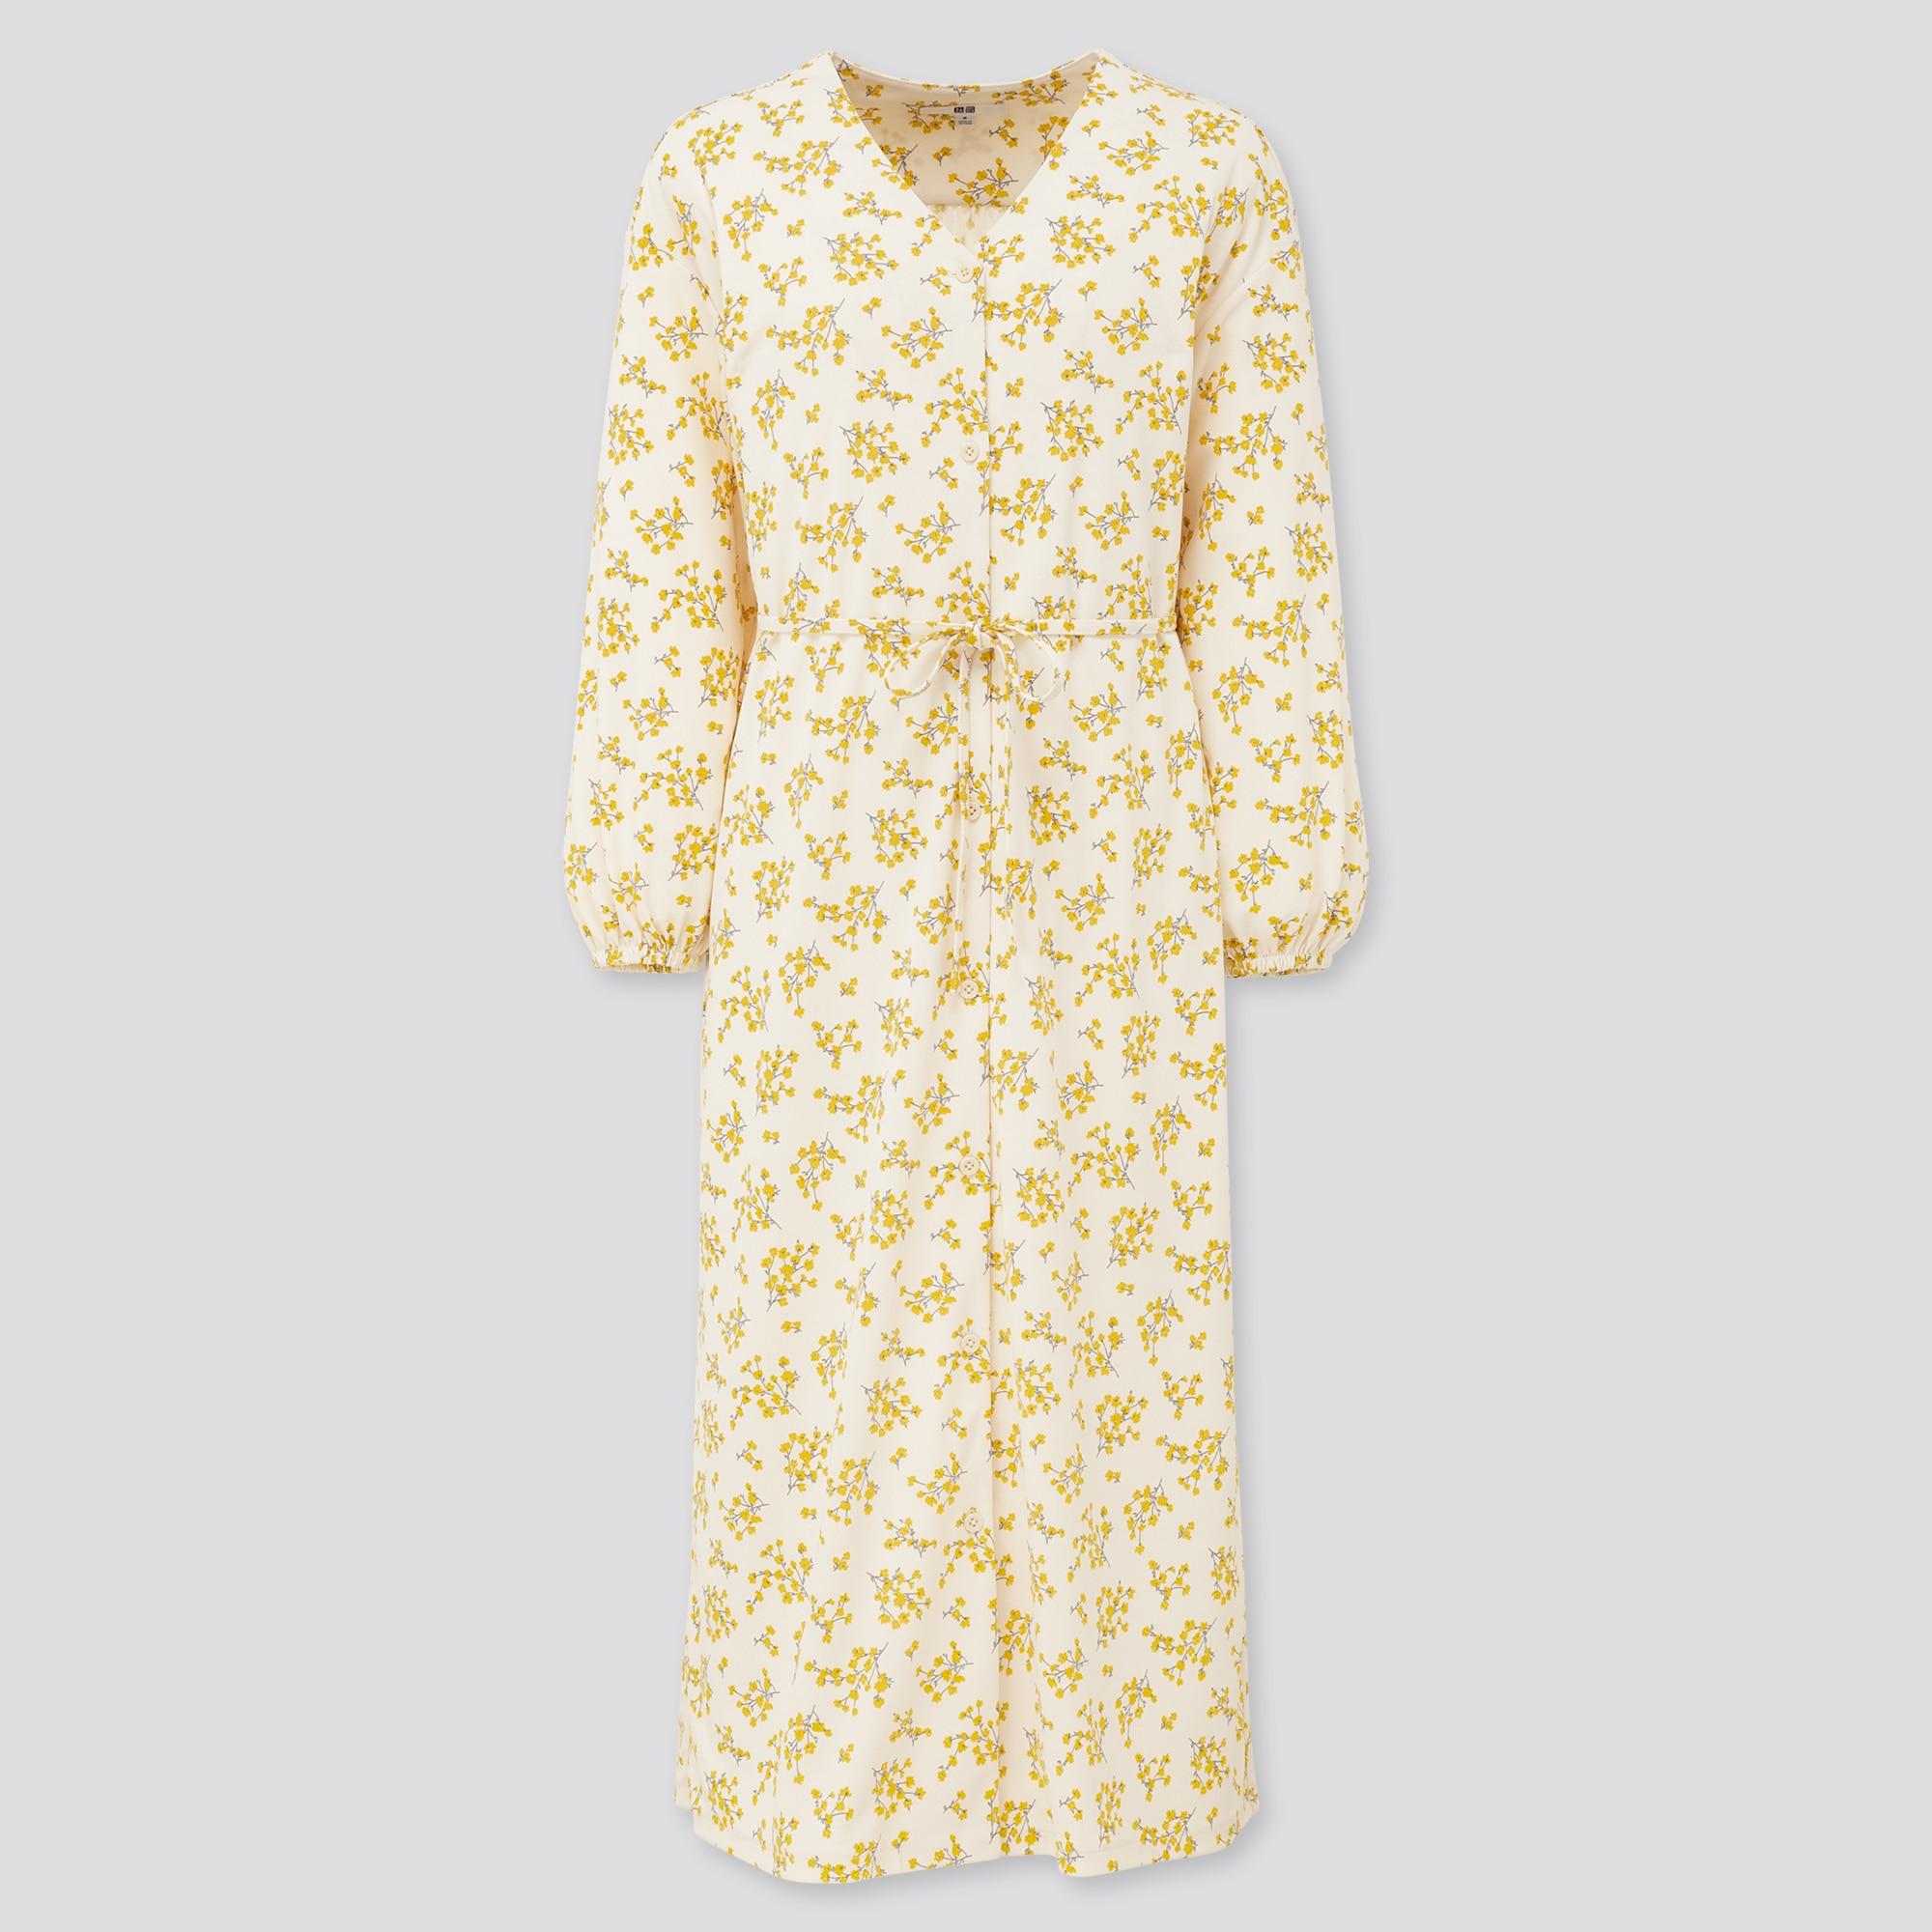 Women Joy Of Print Crepe Jersey Long Sleeved Dress